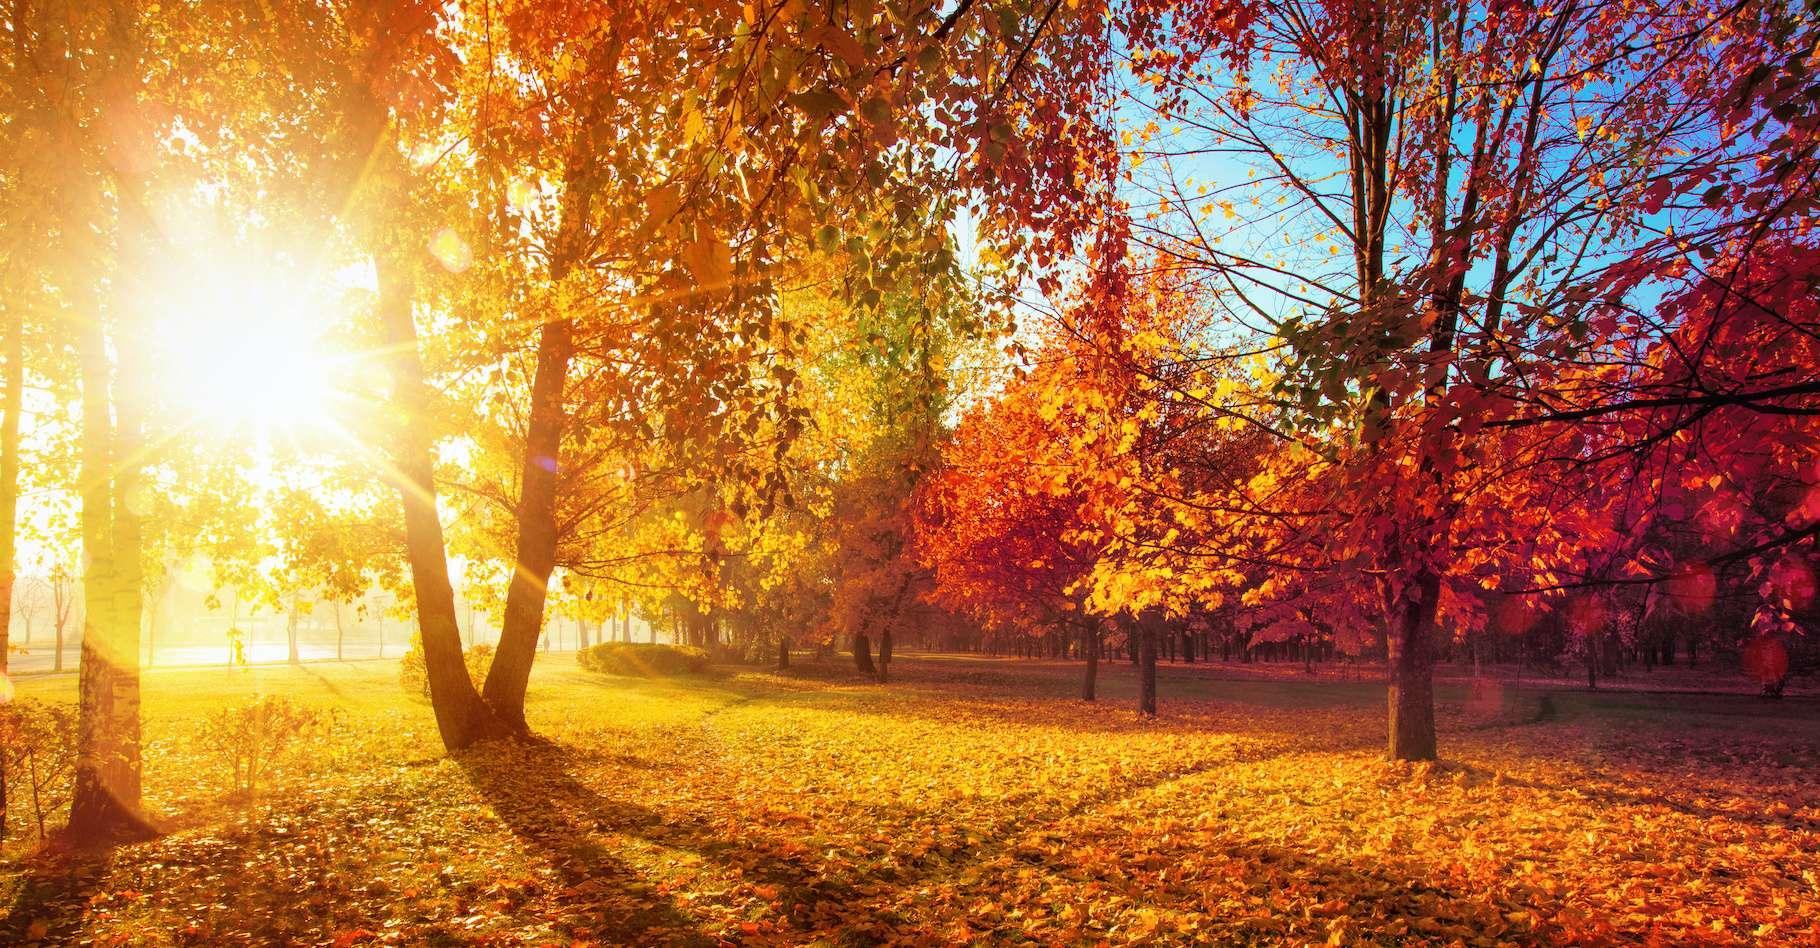 Ce mercredi 22 septembre 2021, à 21 heures 21, ce sera l'automne. © Pasko Maksim, Adobe Stock